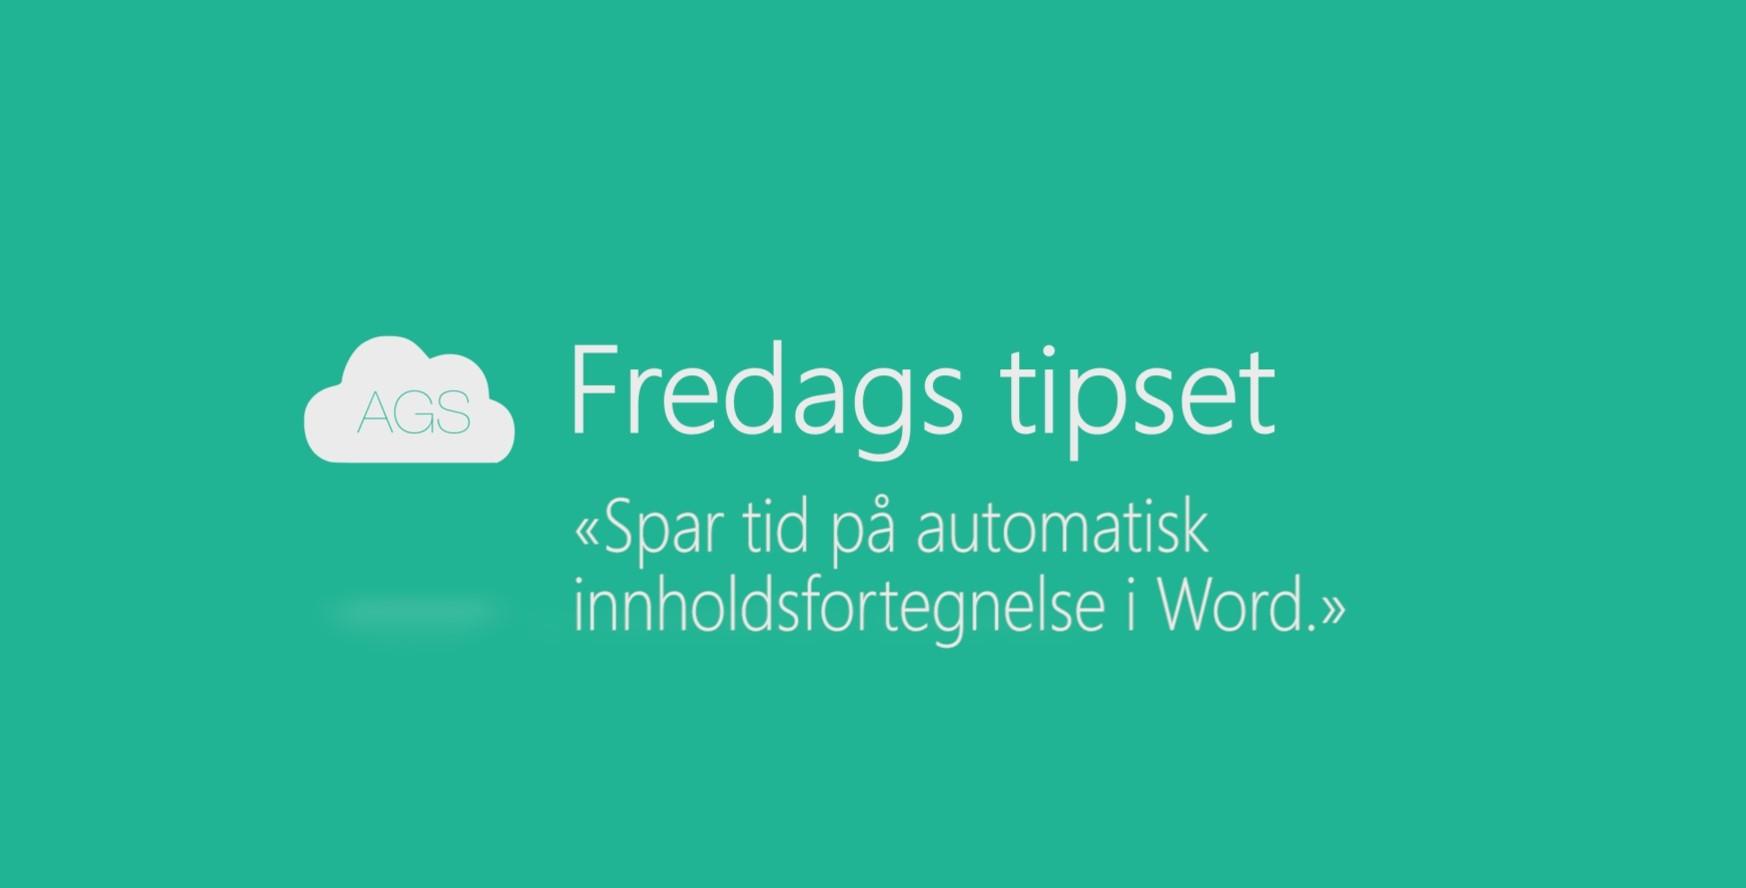 AGS fredags tipset: Spar tid på automatisk innholdsfortegnelse i Word.